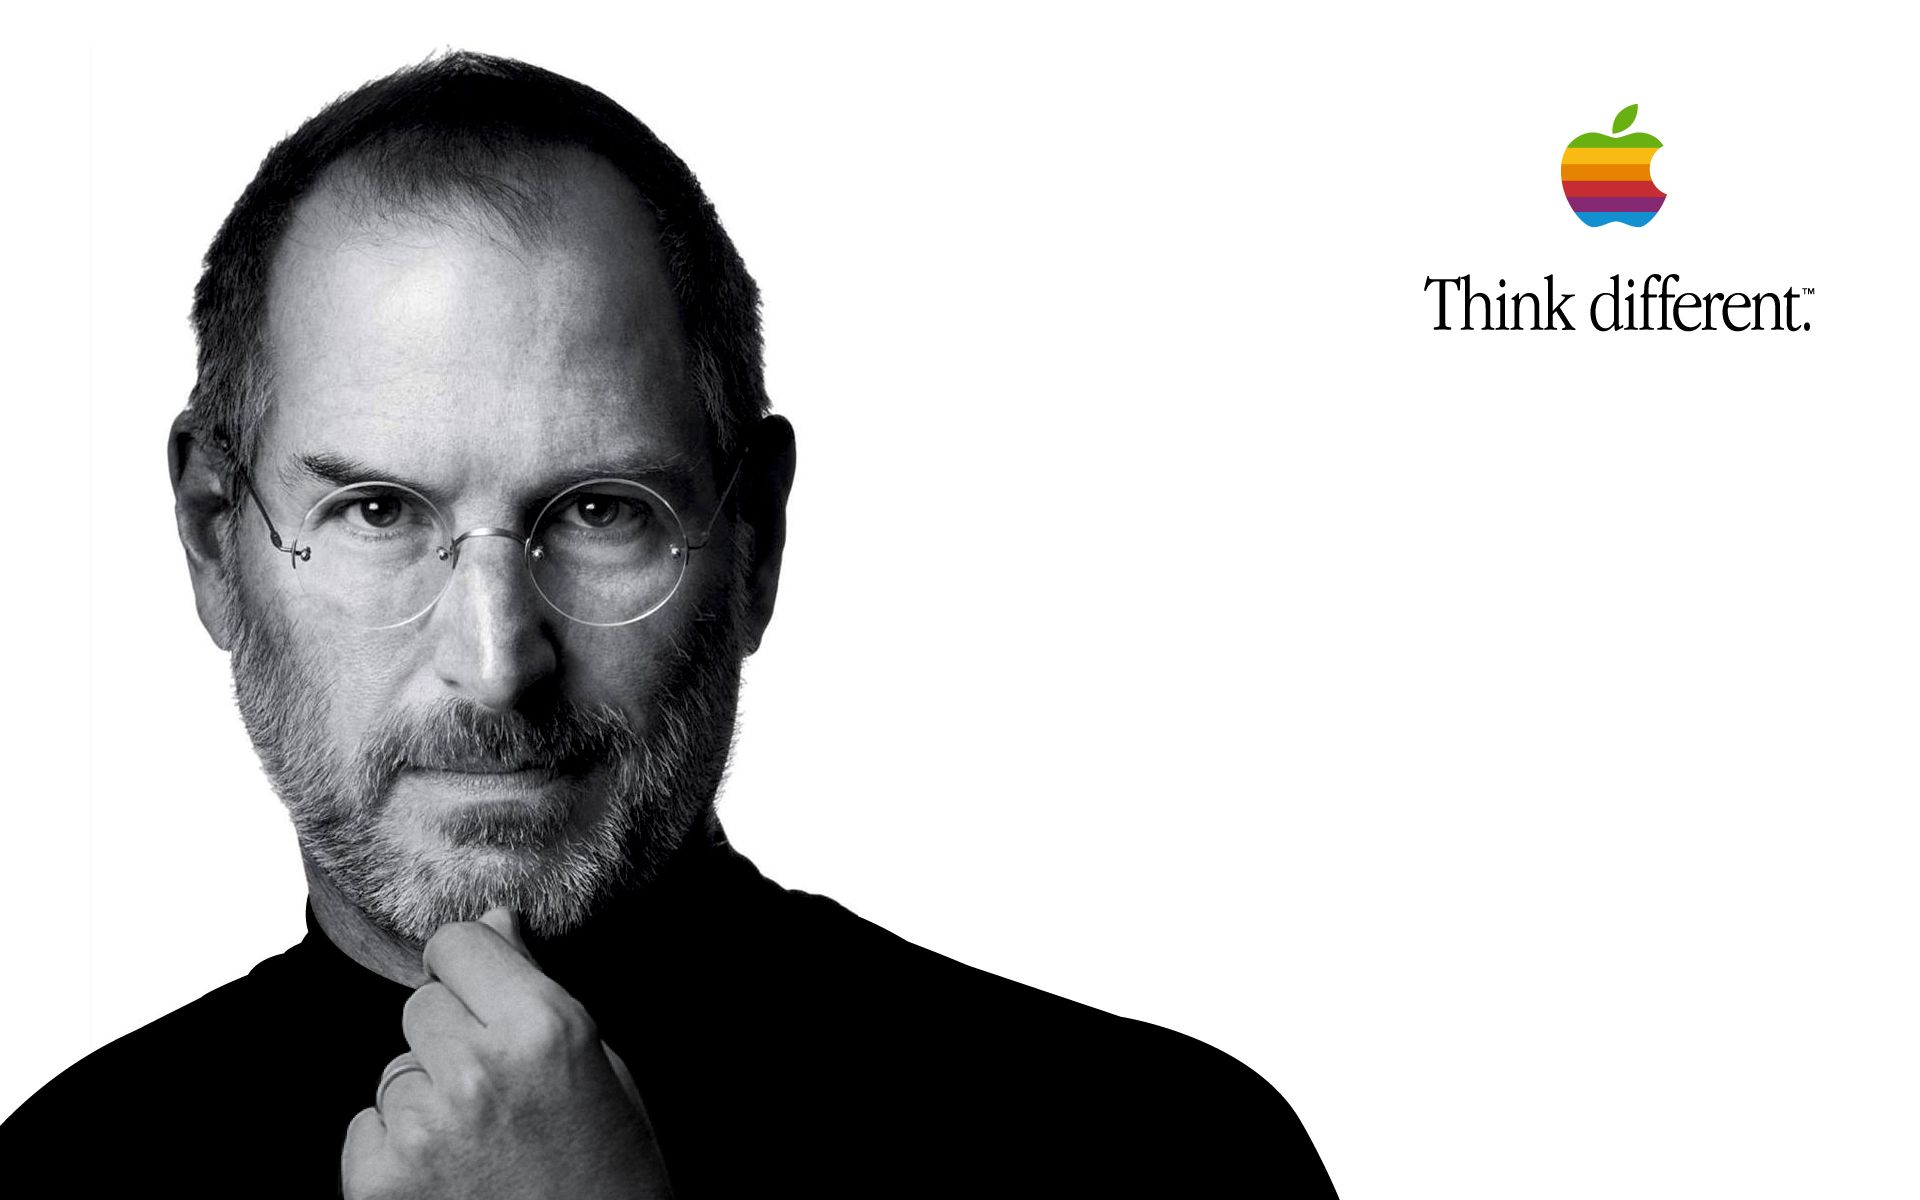 Steve jobs think different by chrisdata on deviantart - Steve jobs wallpaper download ...